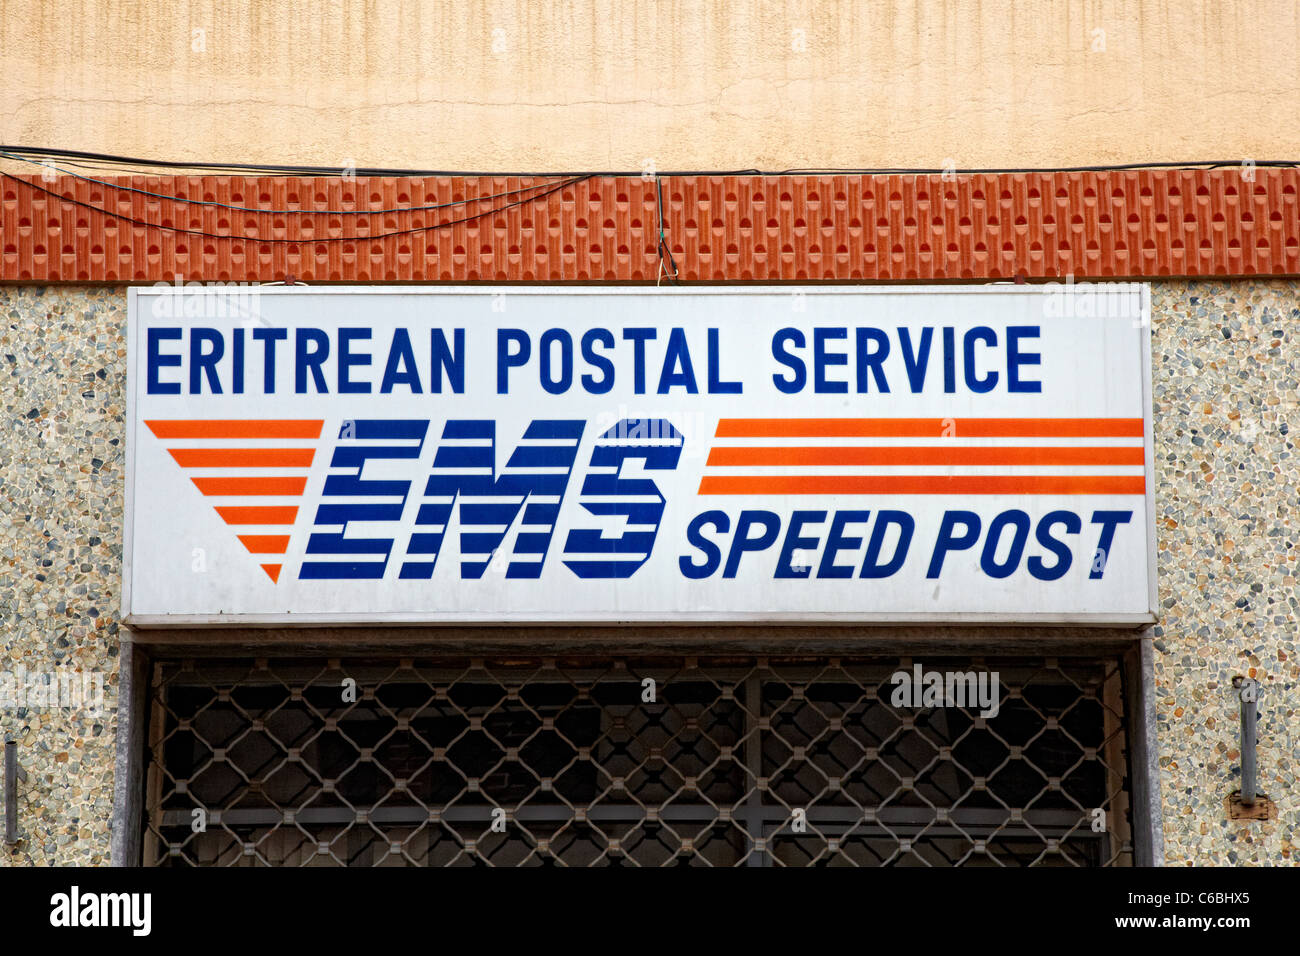 Eritrean Postal Service, Asmara, Eritrea - Stock Image